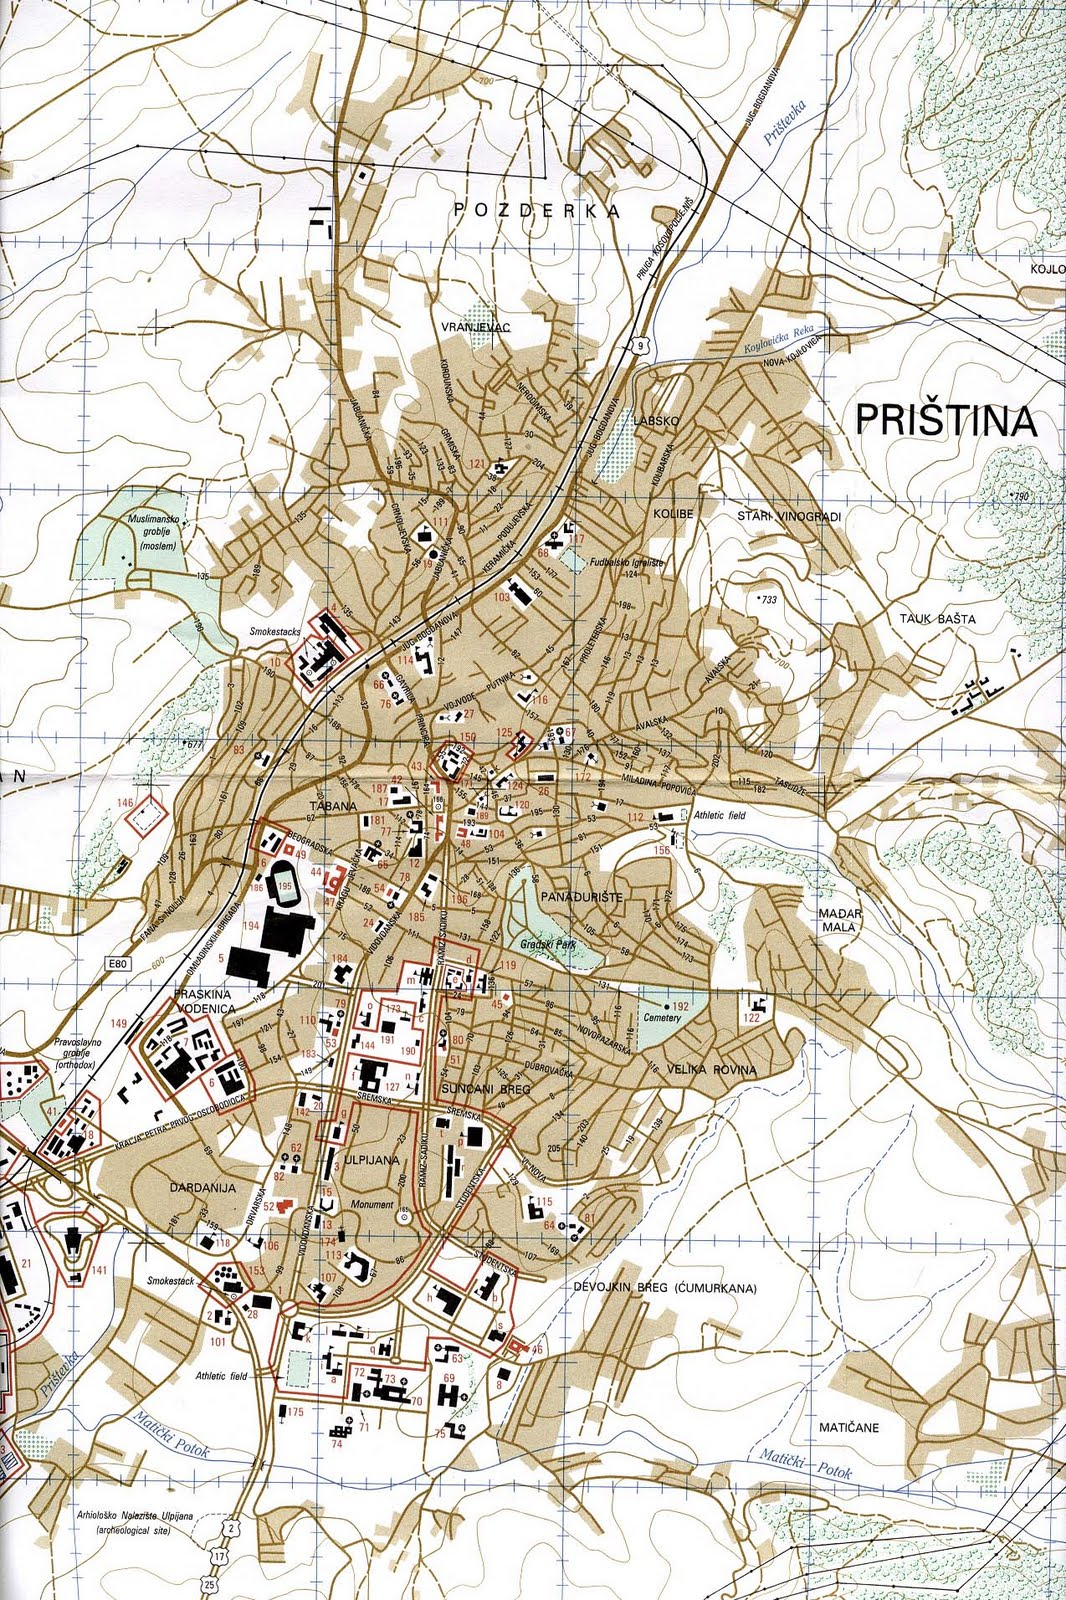 Tylerarchitectureresearchiformal studio prishtina tourist map prishtina tourist map publicscrutiny Choice Image